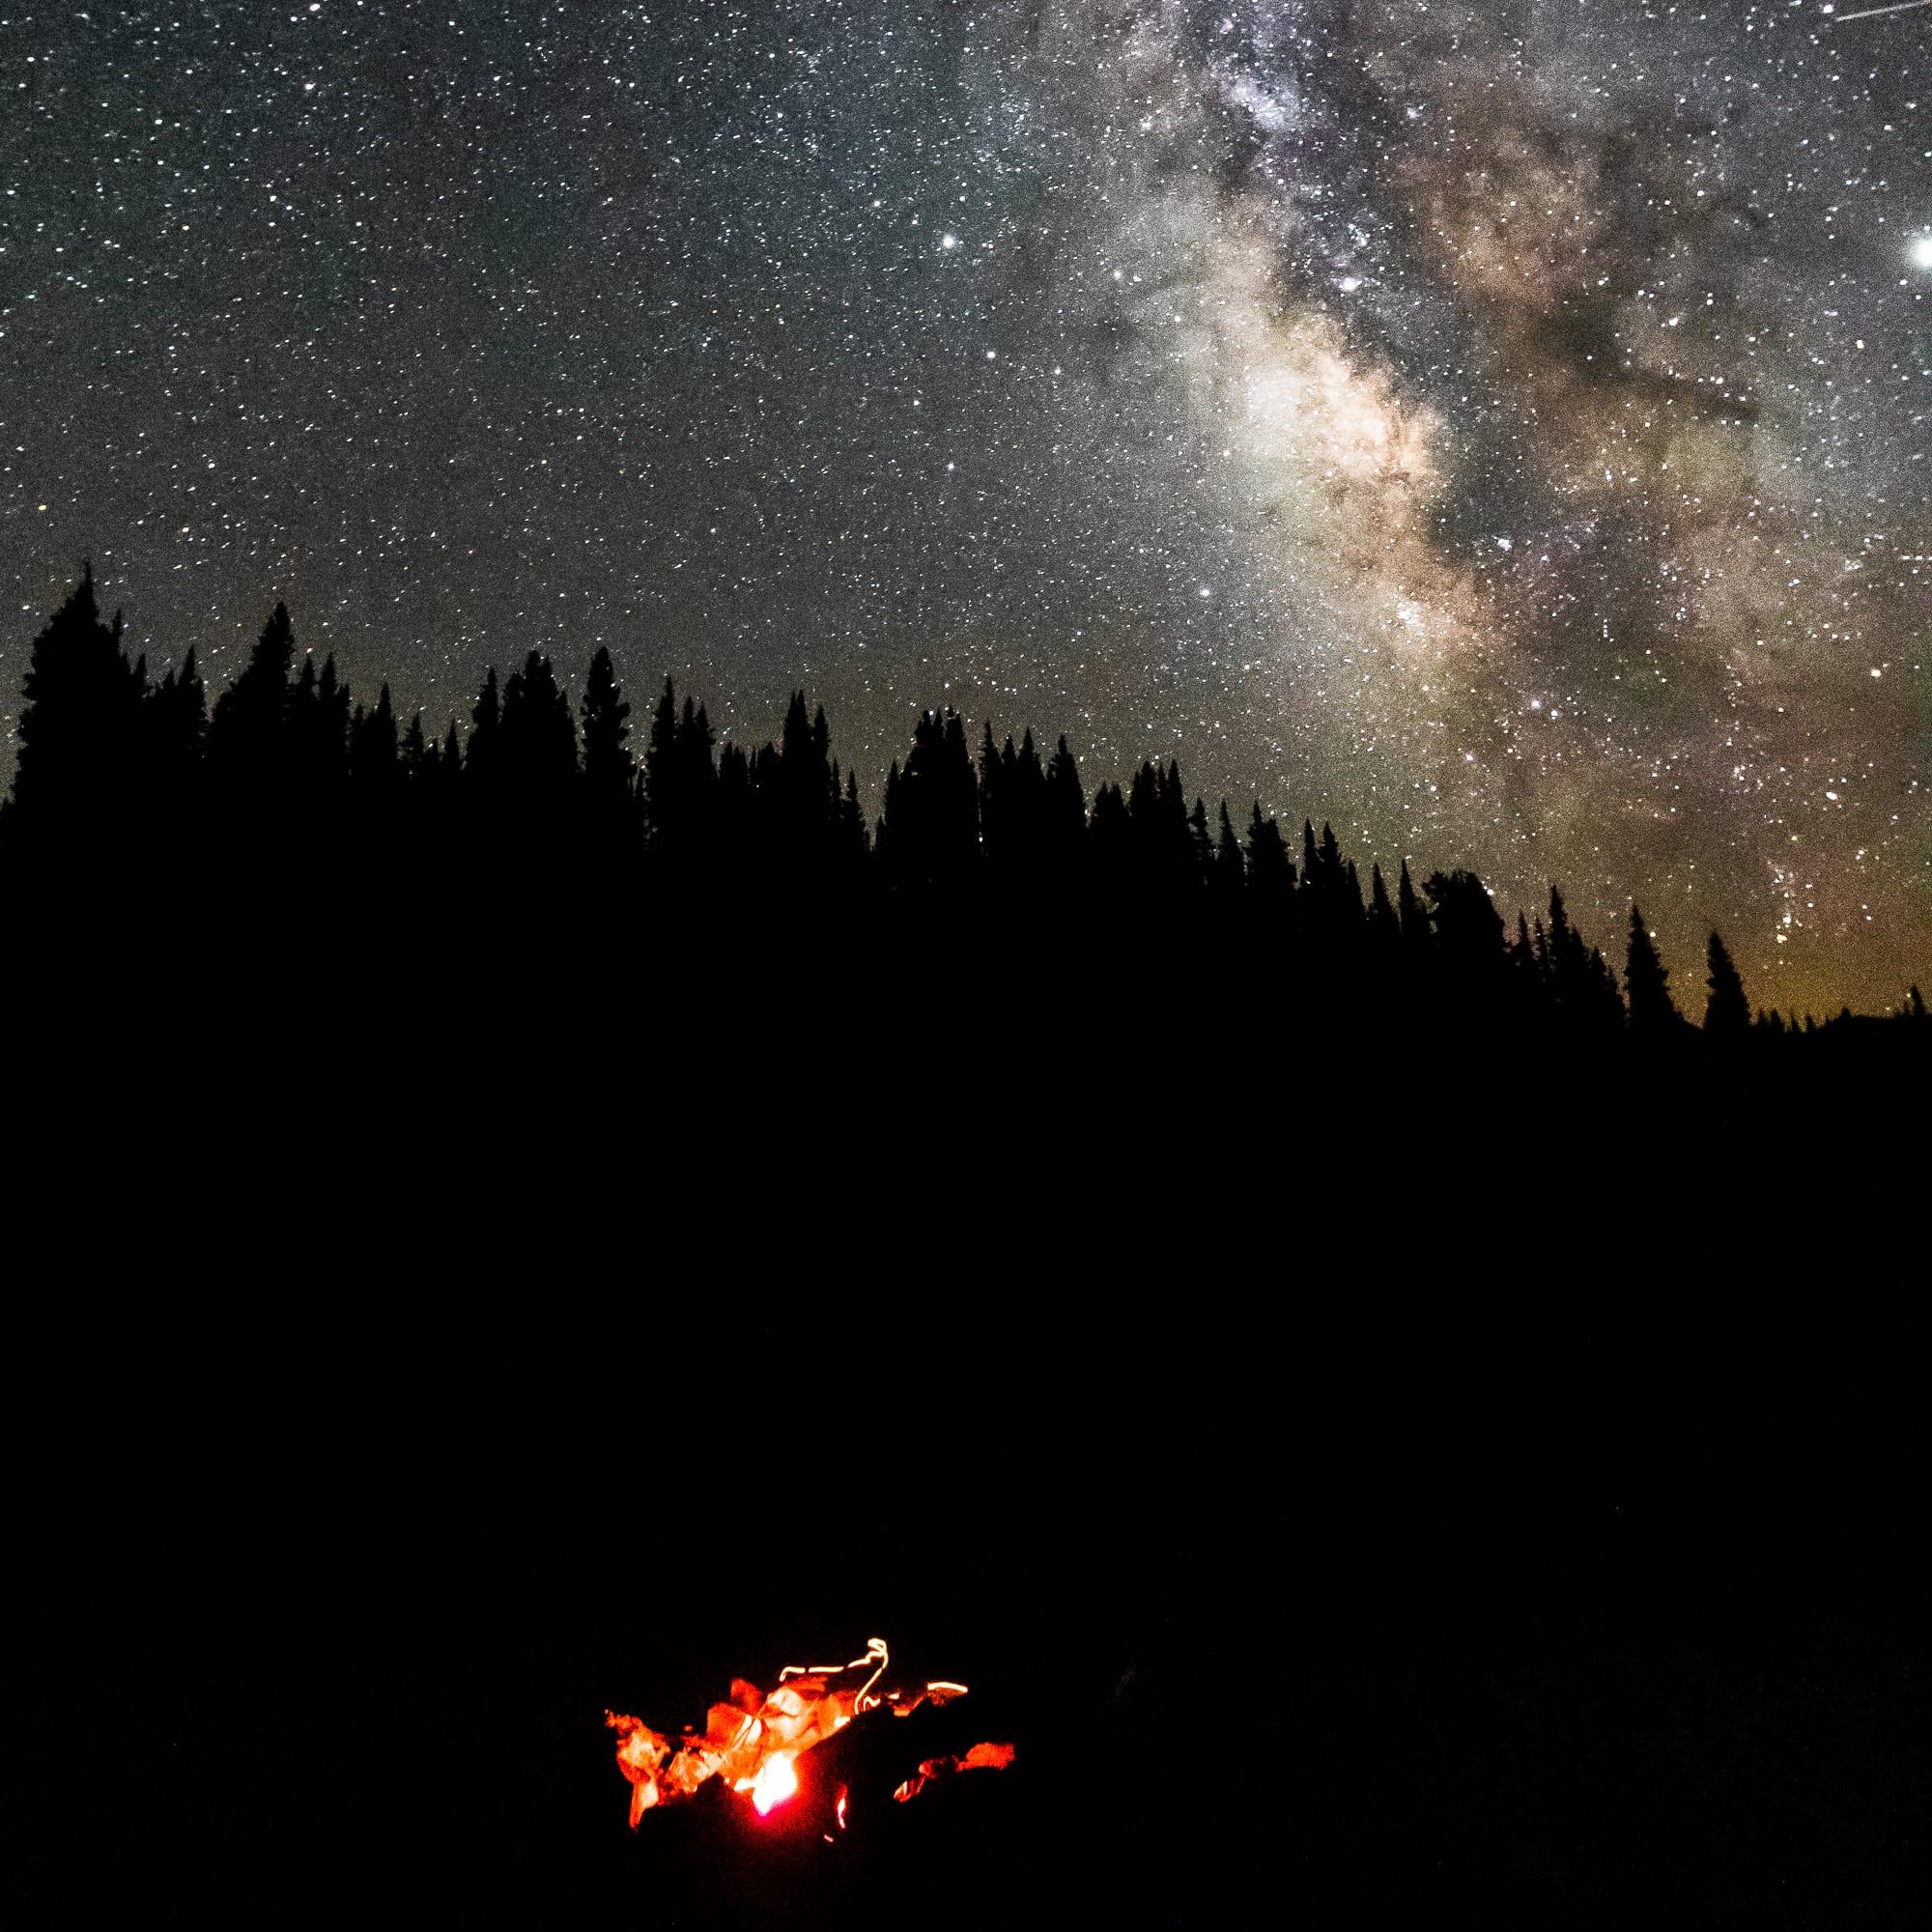 camping checklist photo 2